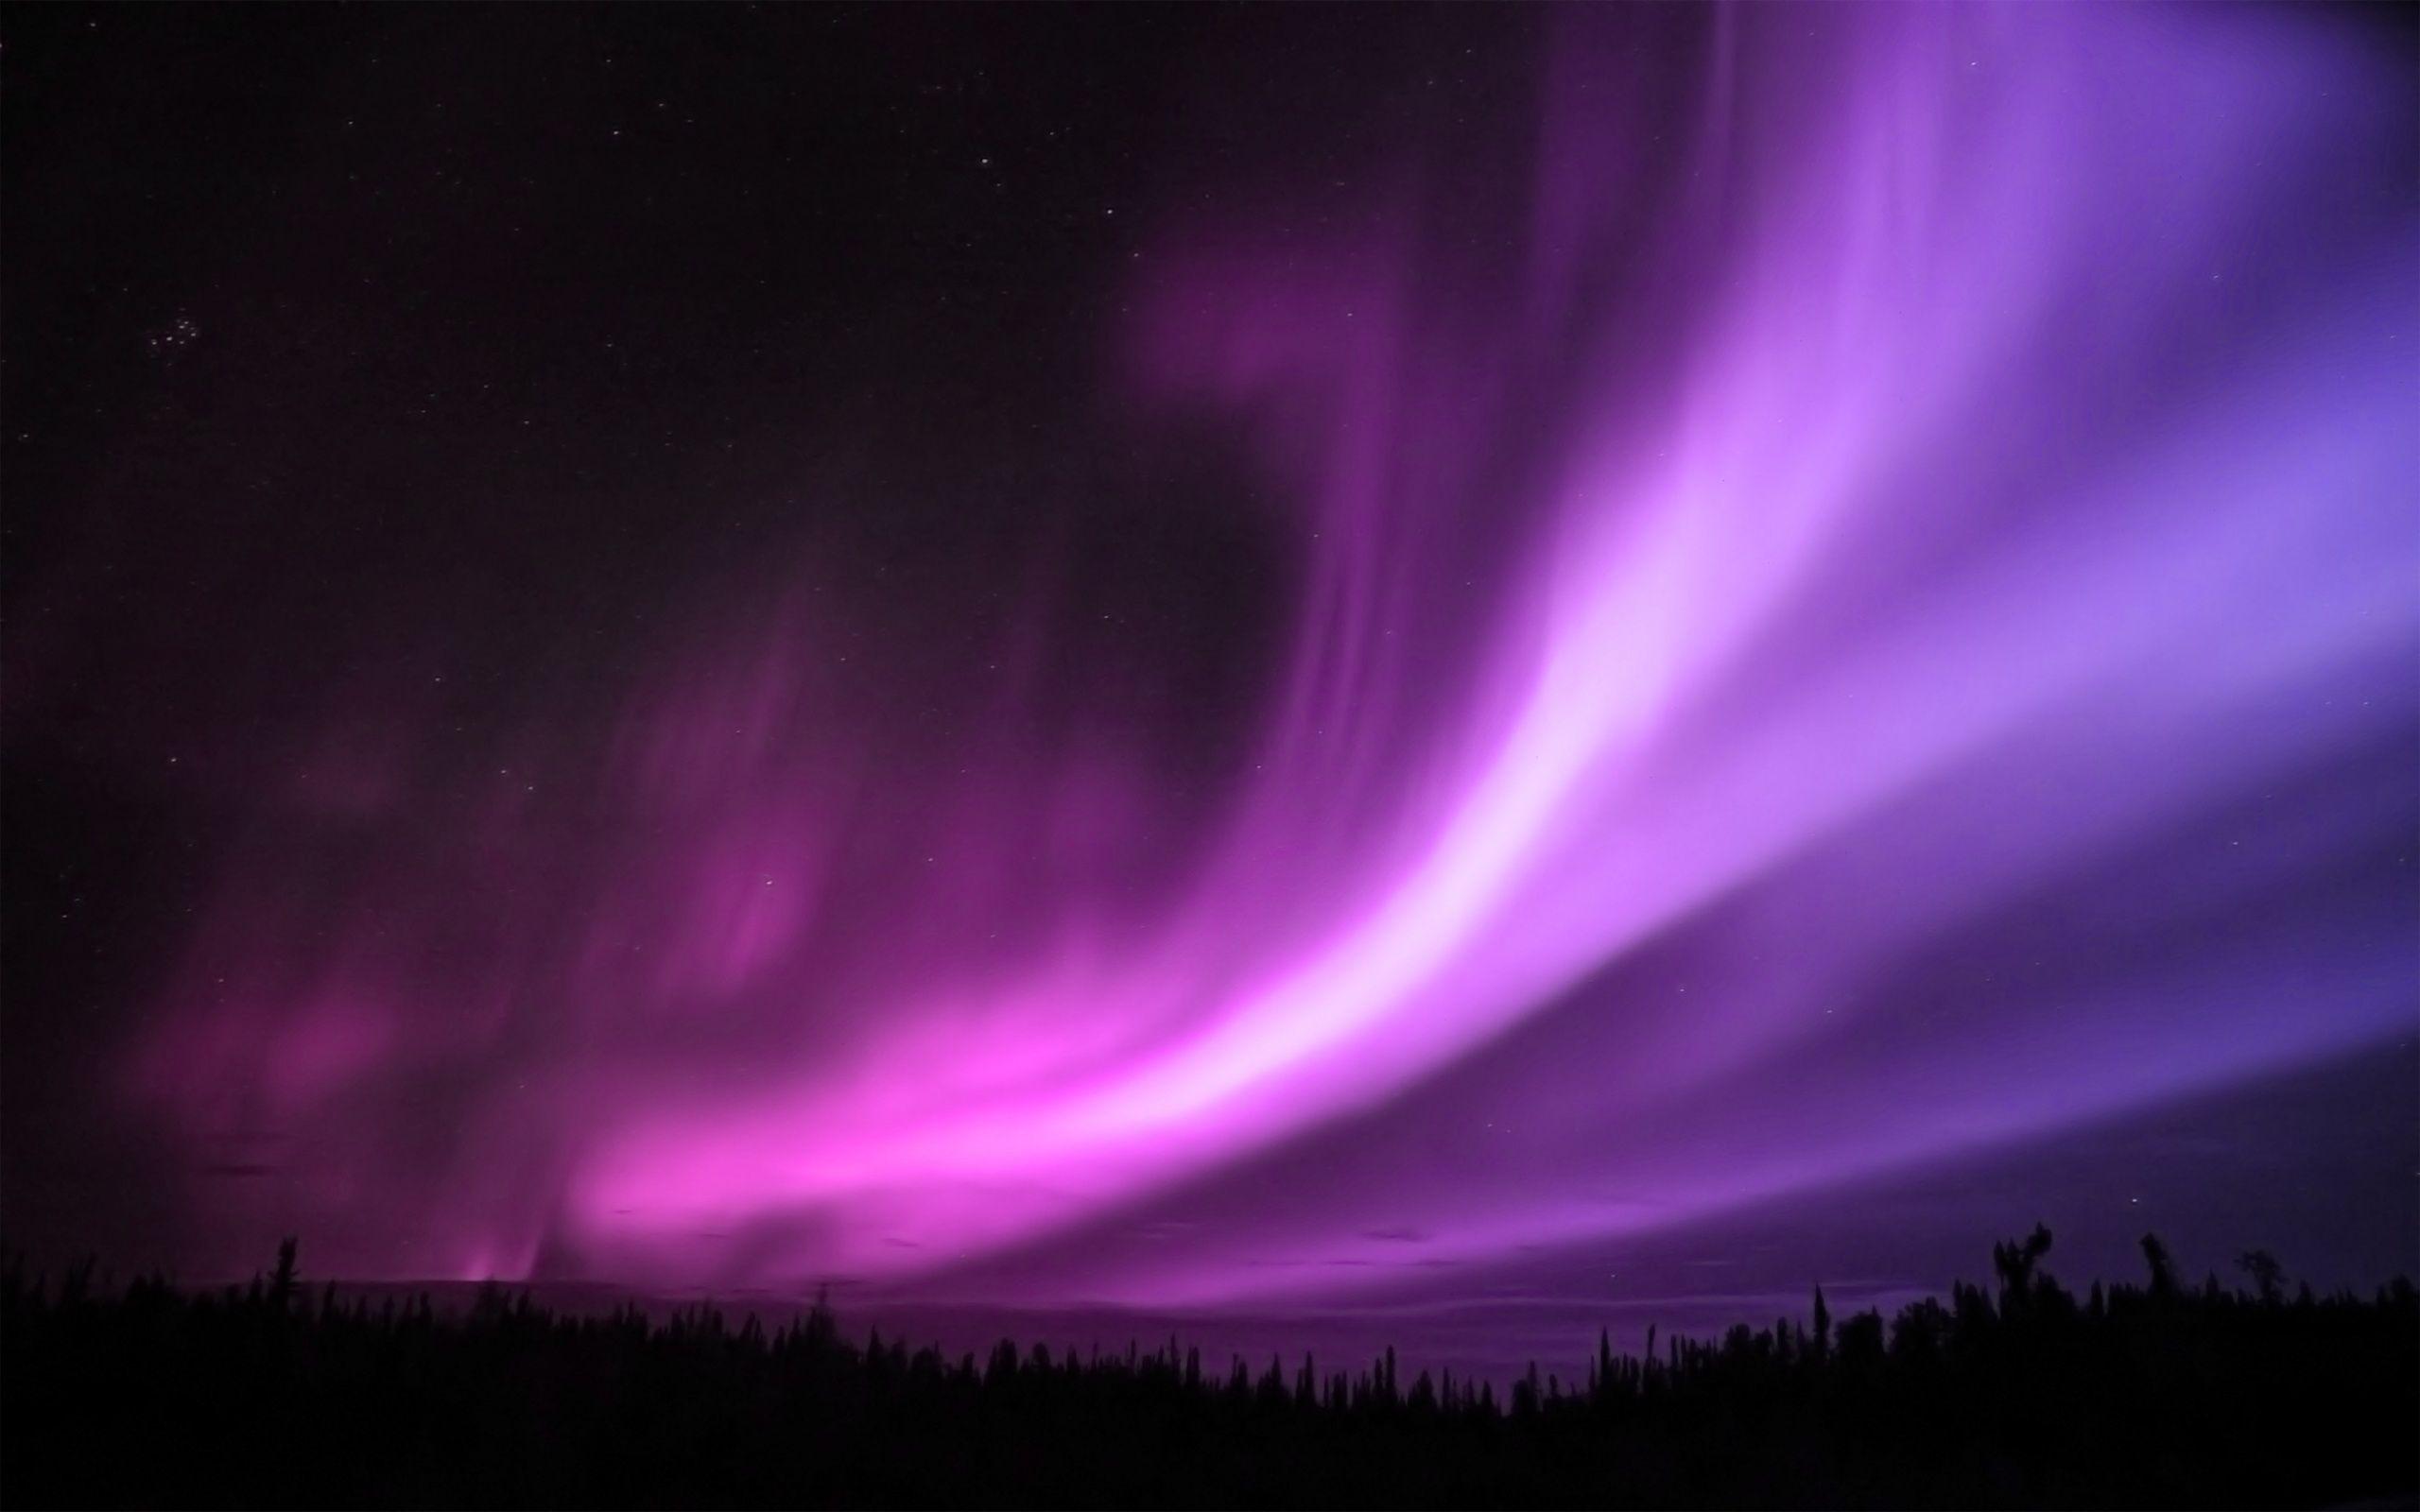 Purple Aurora Borealis Wallpaperswide 46488 The Hd Wallpaper Northern Lights Aurora Borealis Northern Lights Aurora Sky